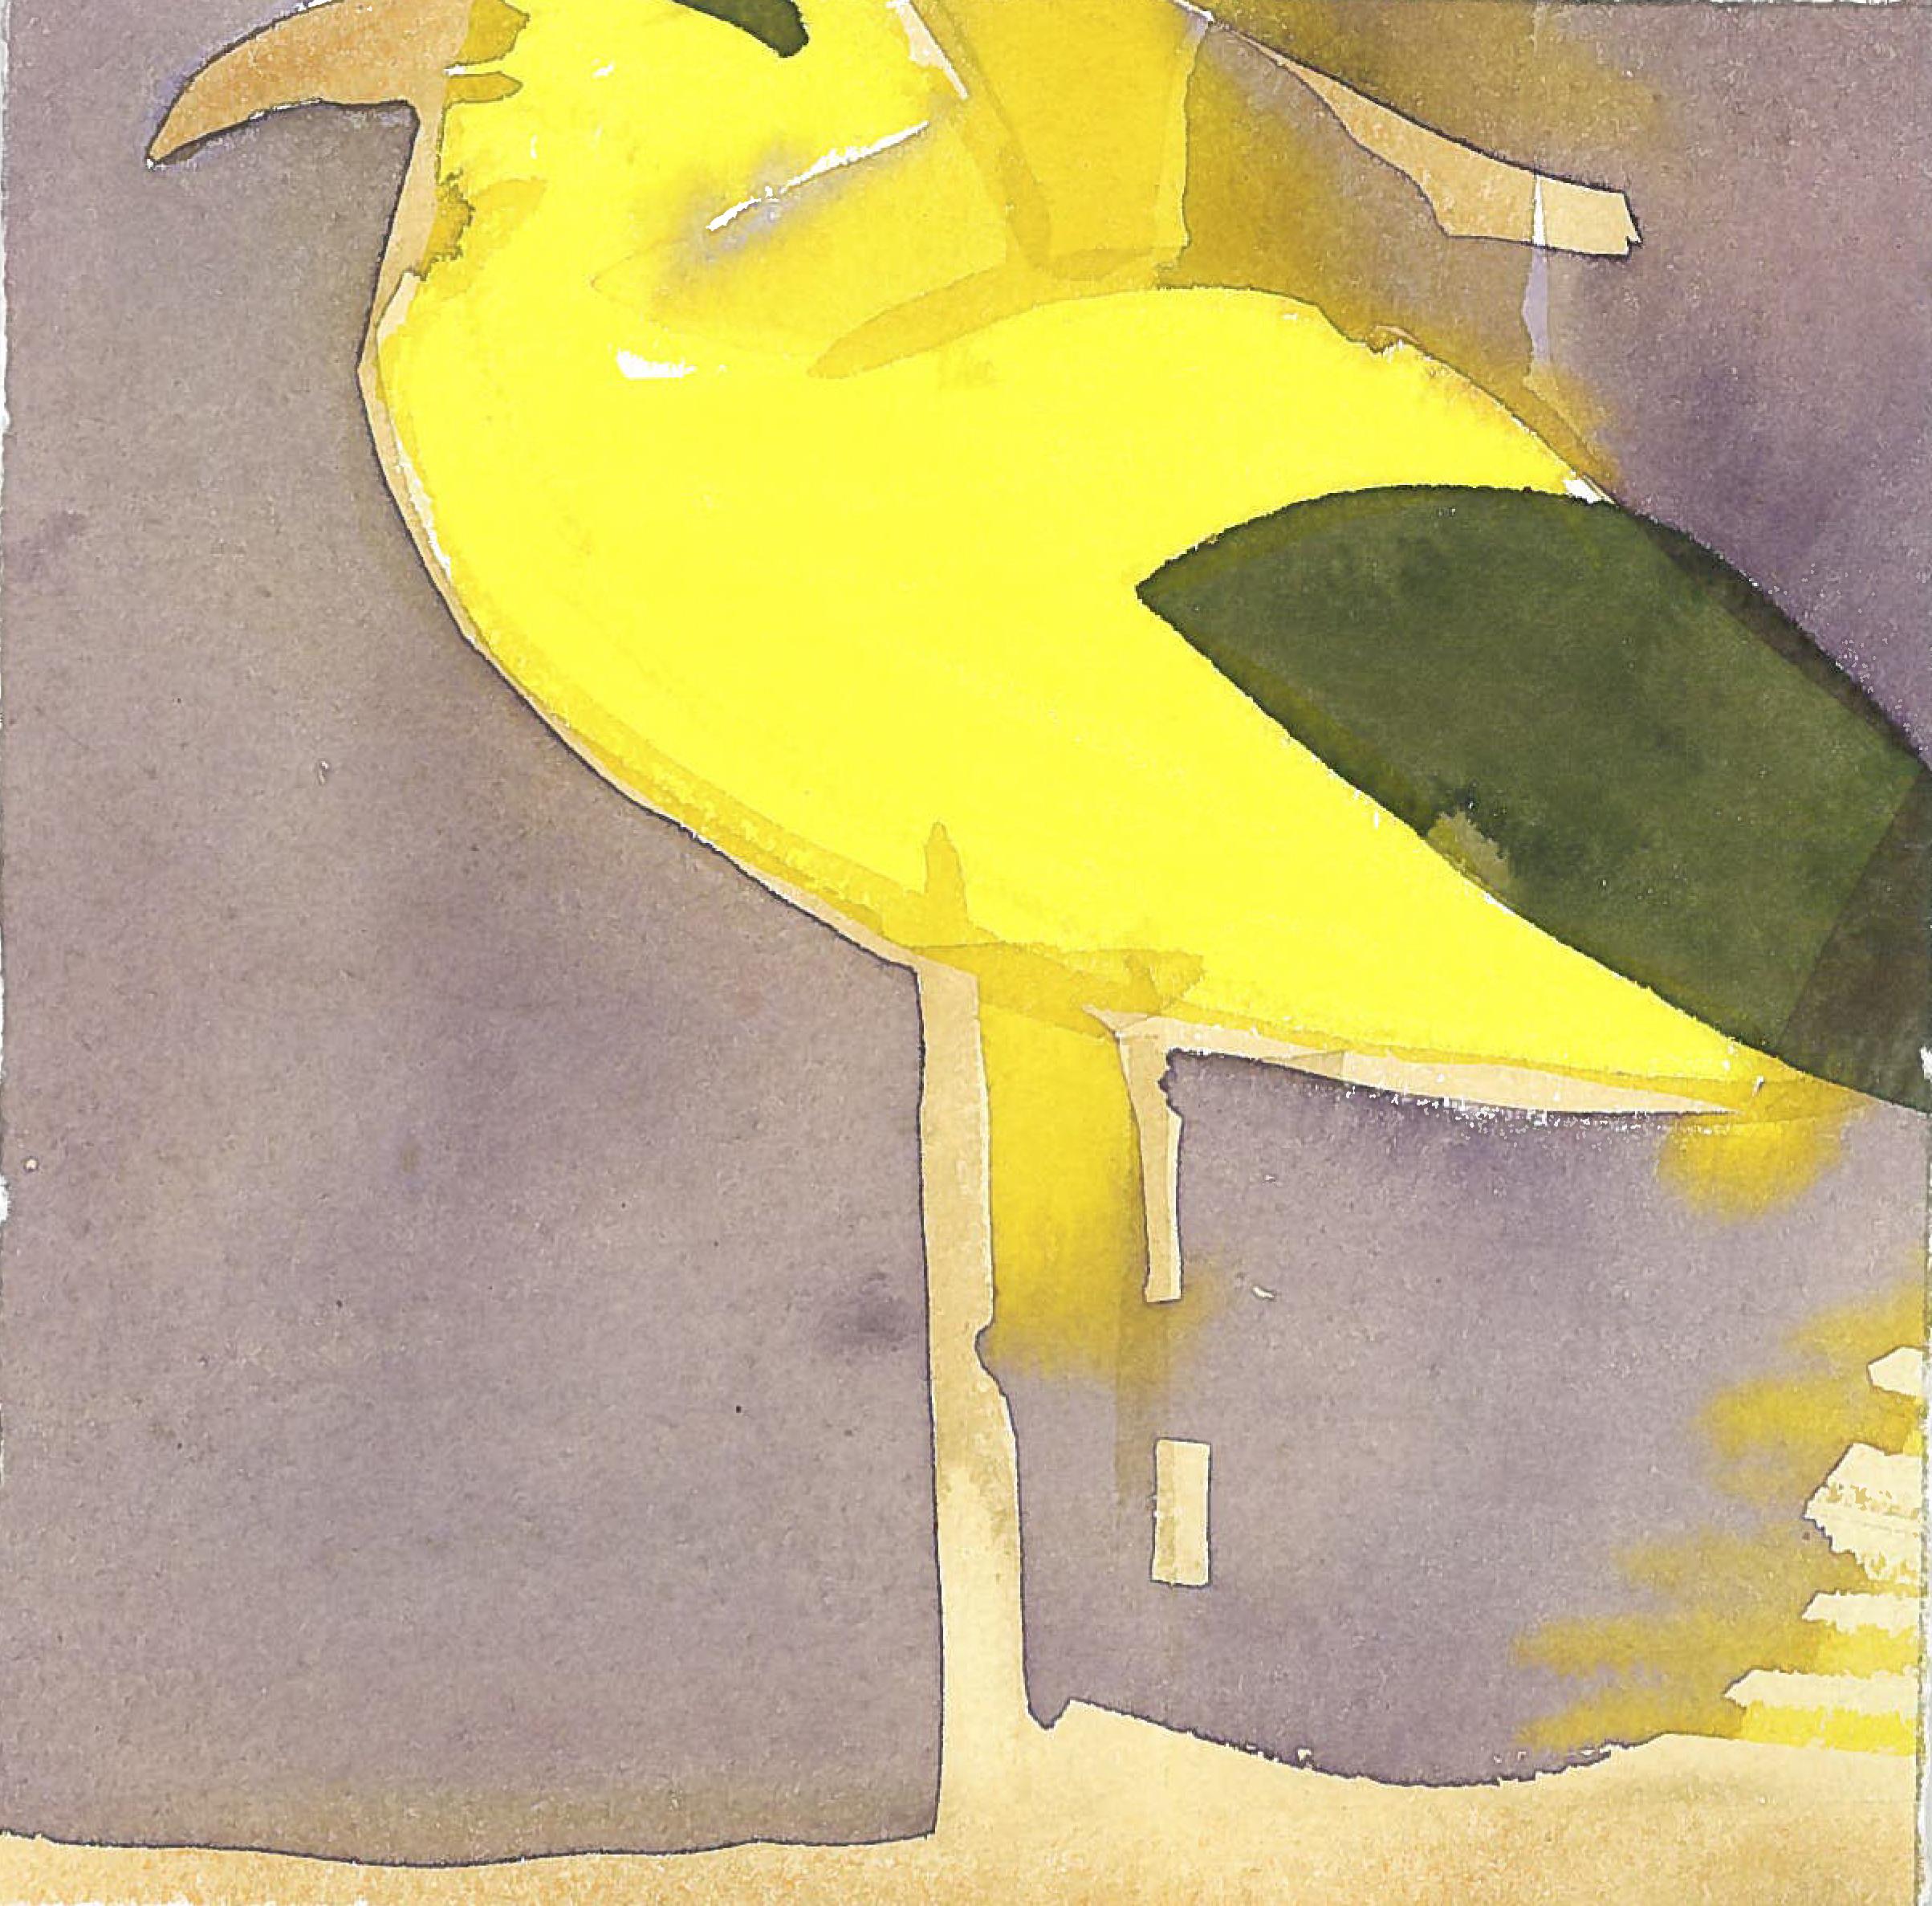 According to Romain Gary King Solomon. Watercolor on print paper 15x21cm. 2017